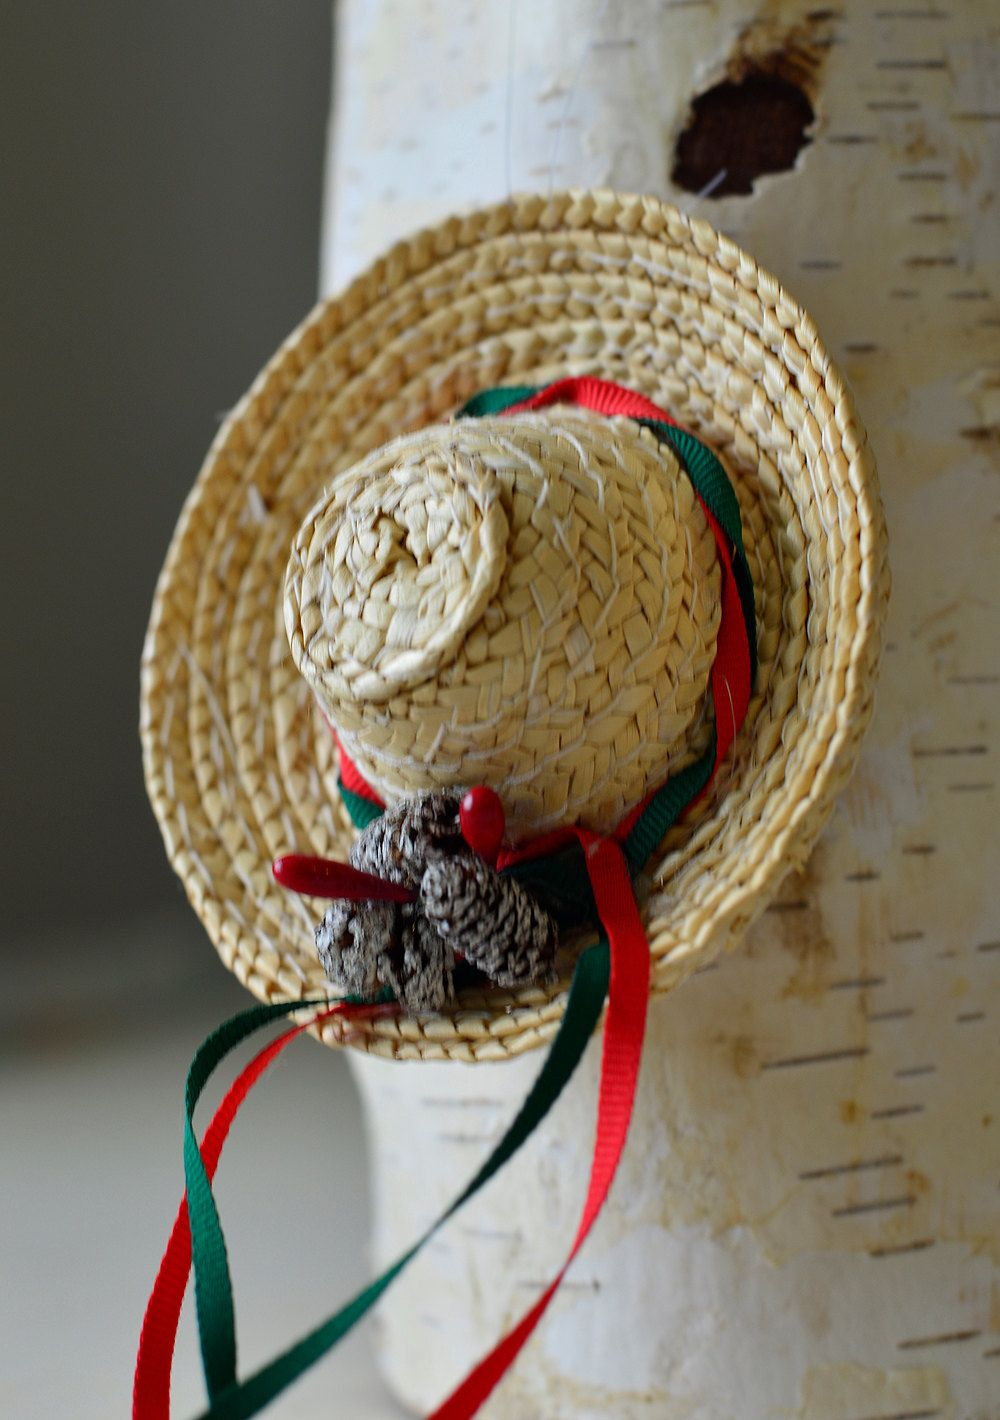 VintageChristmas Ornament Wicker hat | Etsy | Vintage